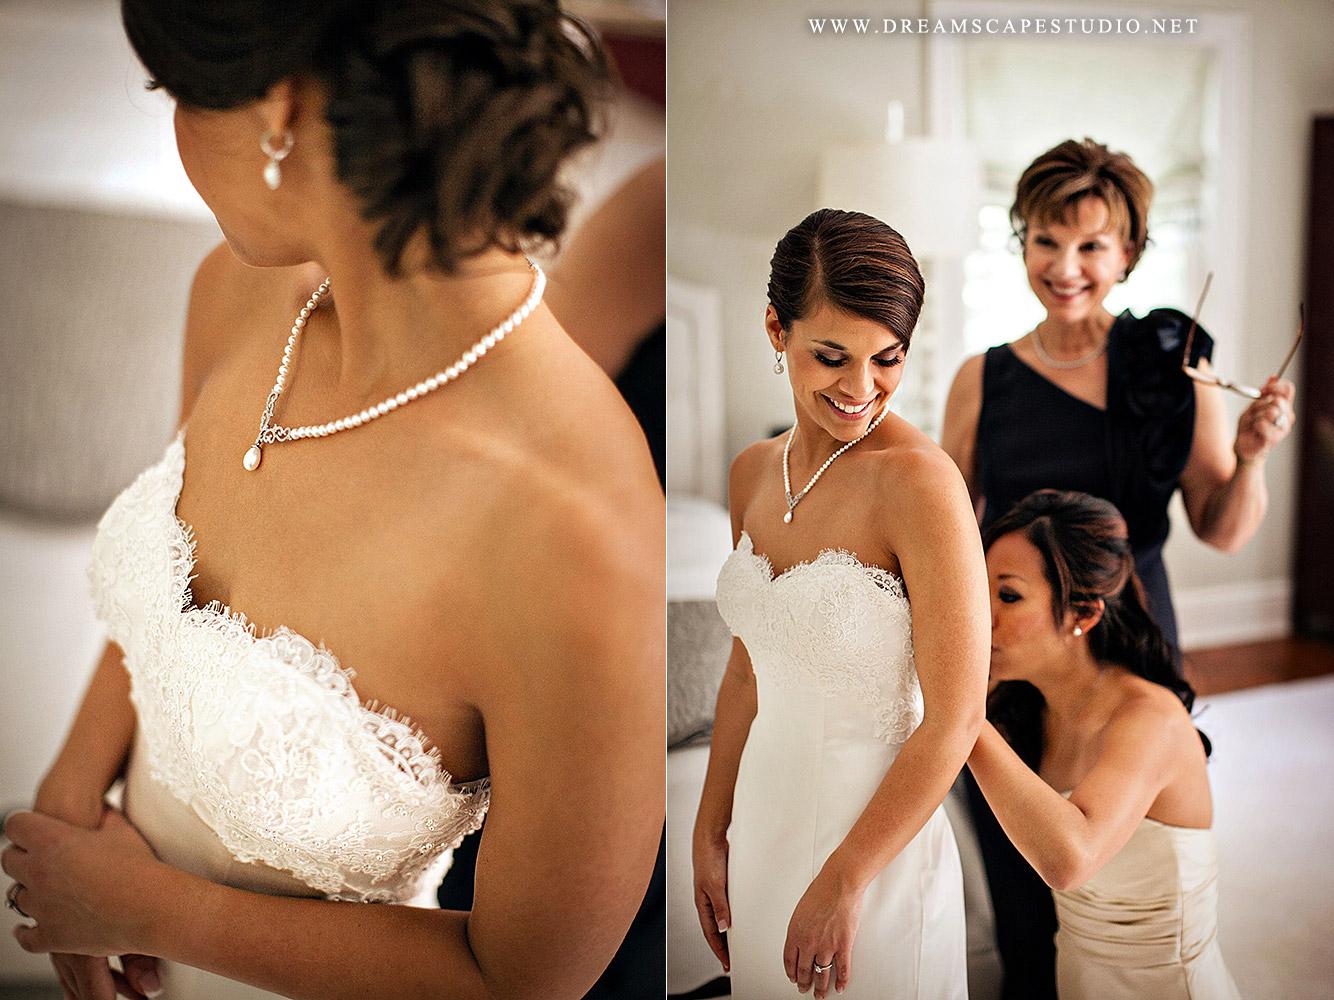 CT_Wedding_Photography_Liz_Justin_04LiJu.jpg